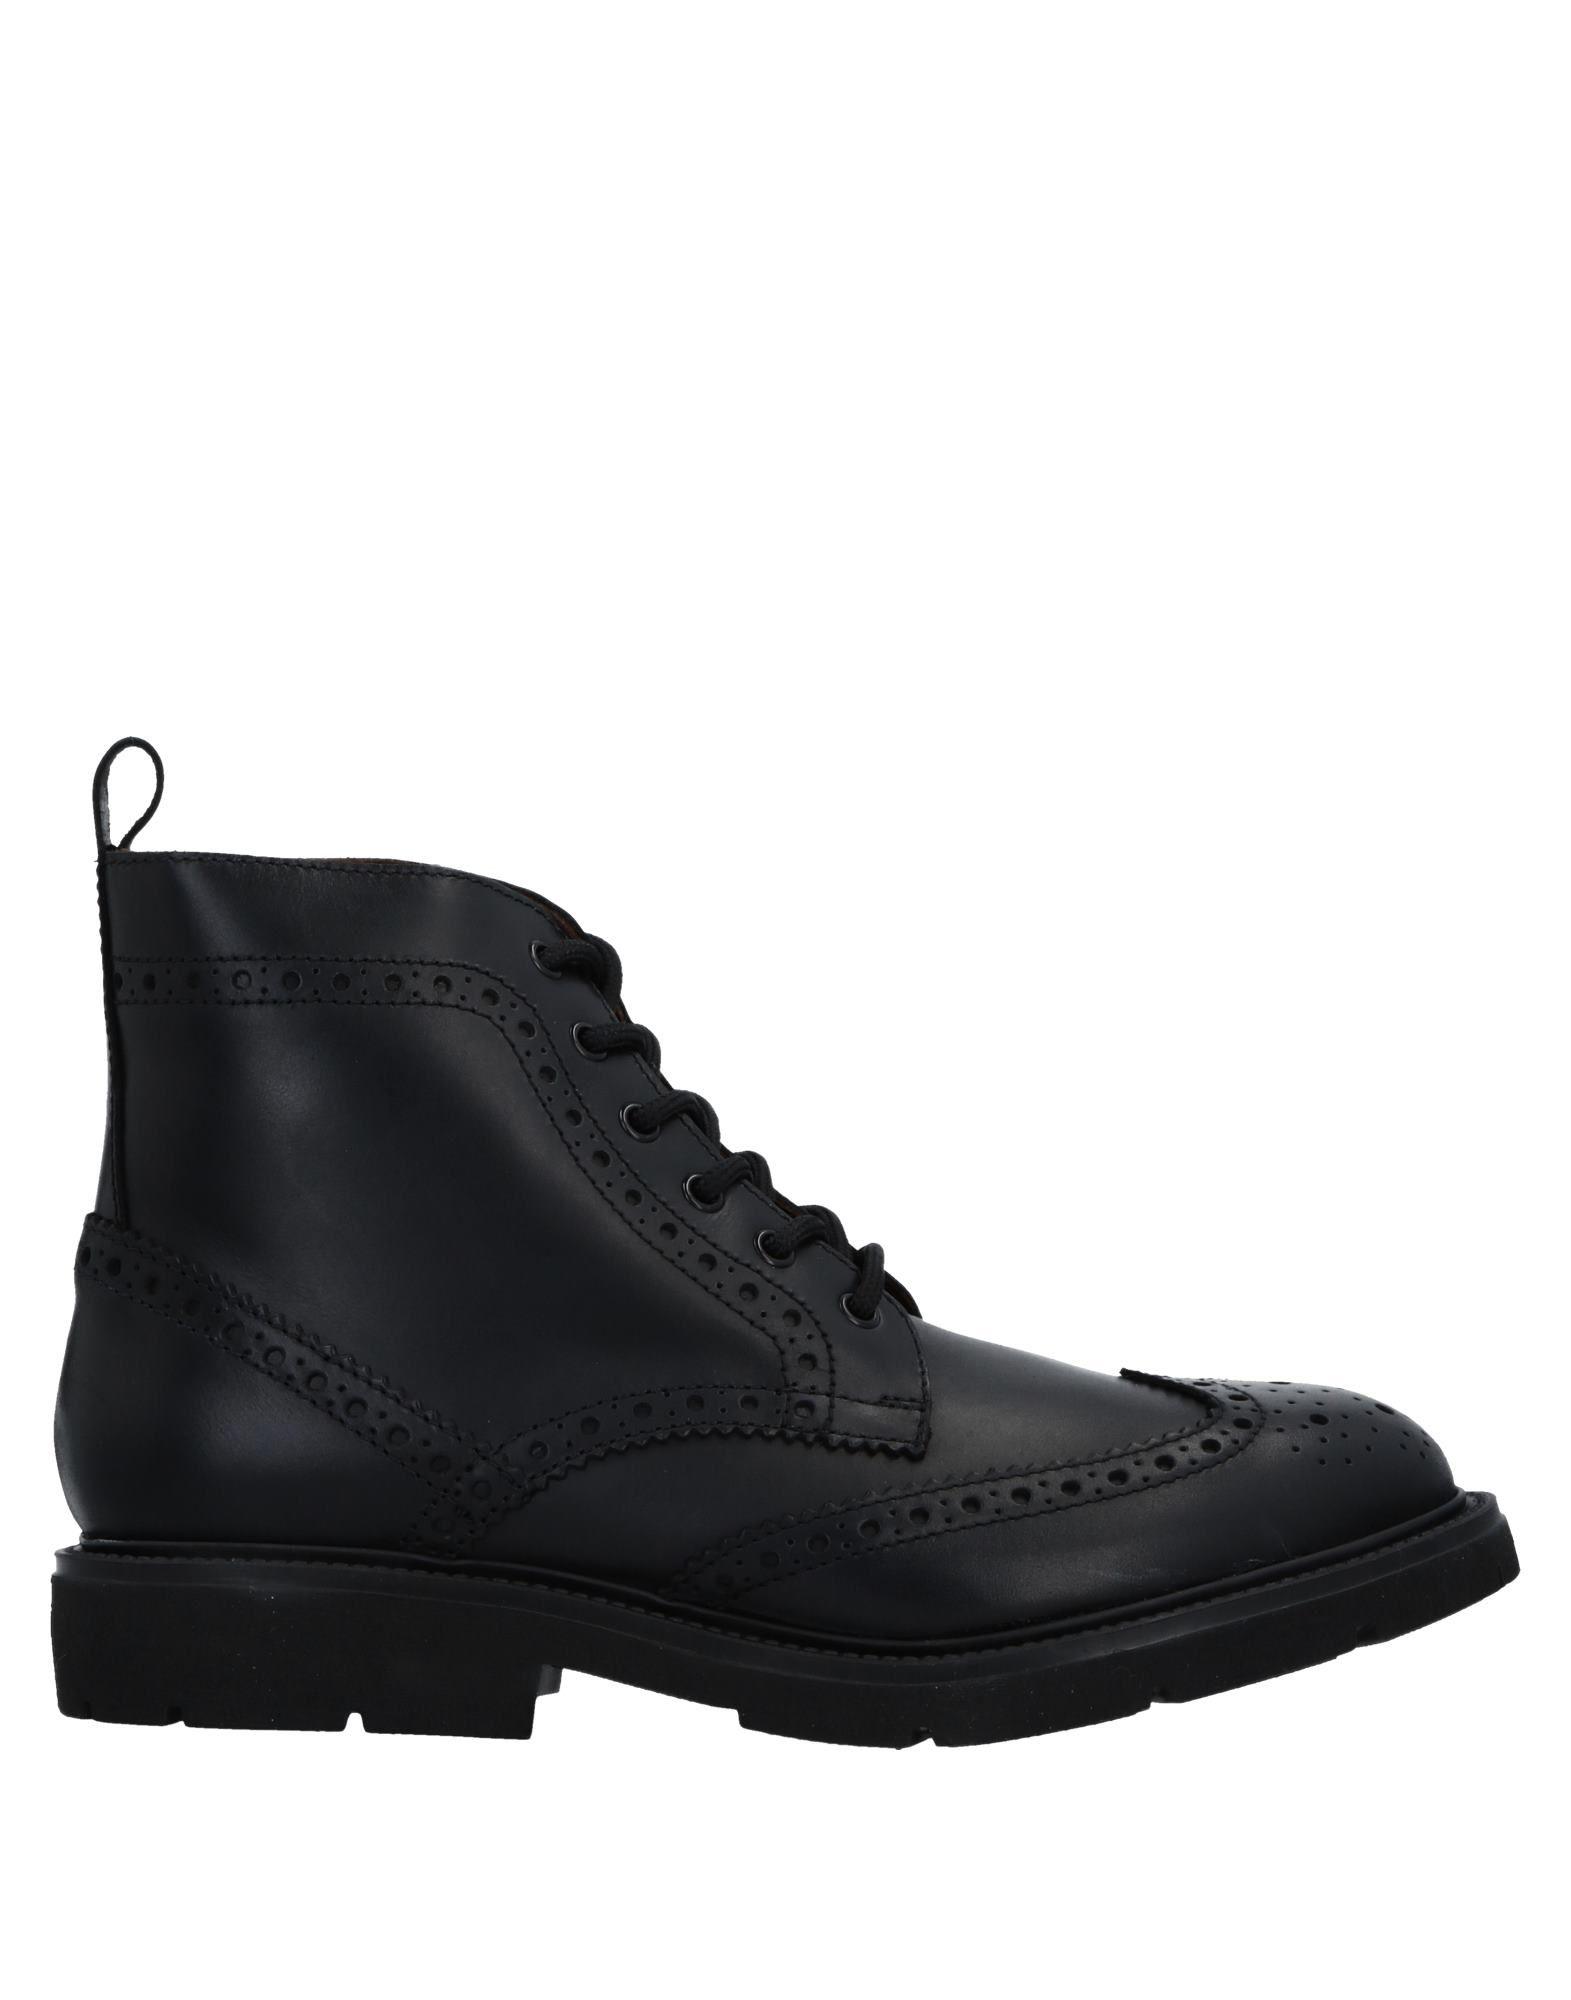 Rabatt echte Schuhe Frau Stiefelette Herren  11534061FP